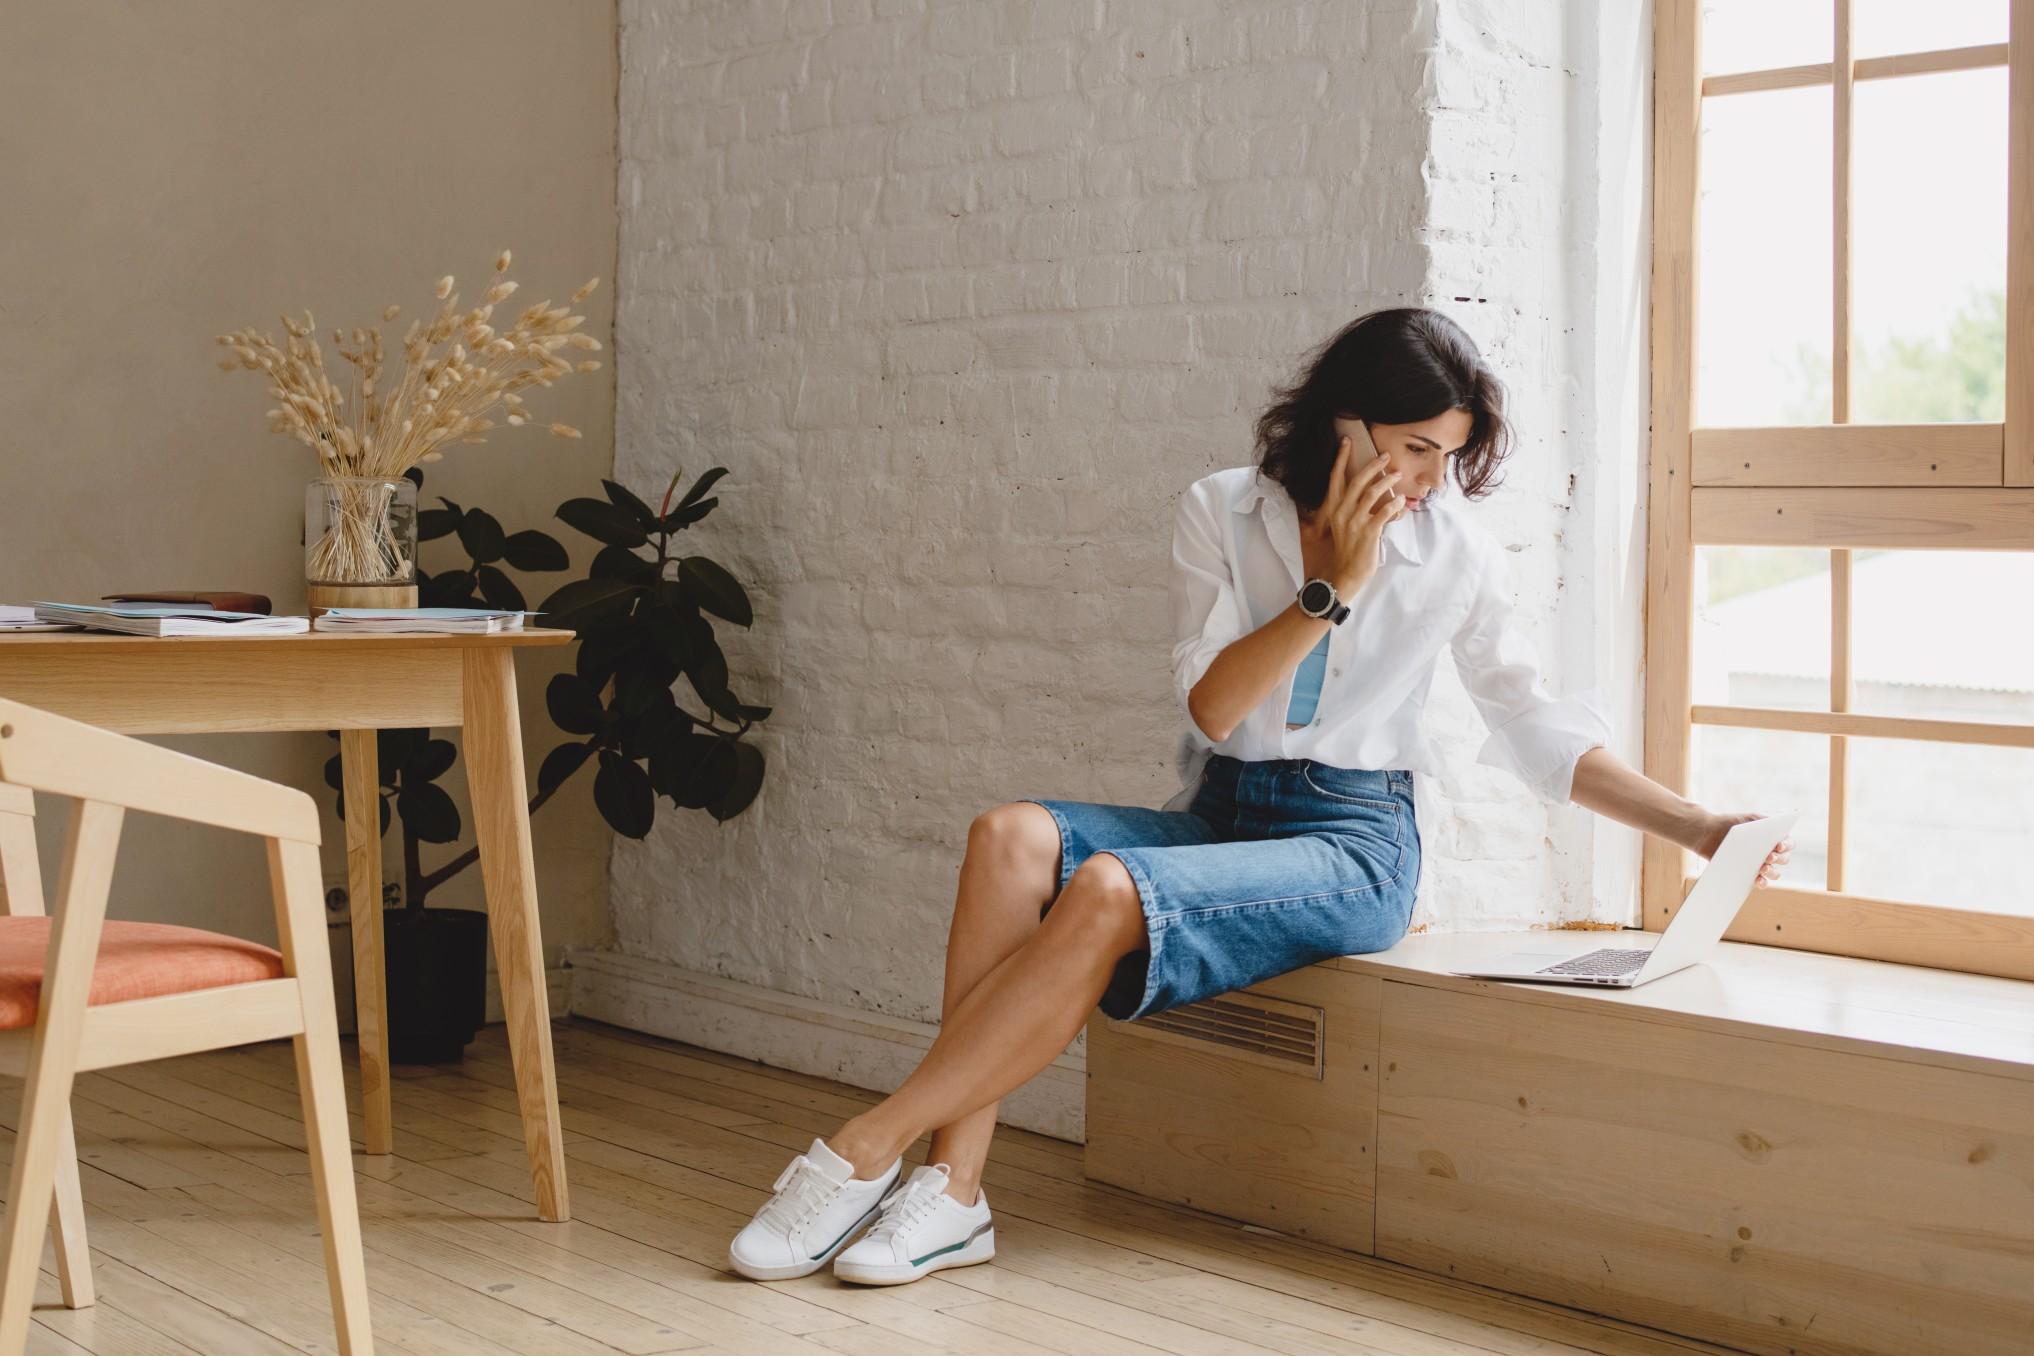 remote-business-technology-businesswoman-woman-laptop-work-internet-workspace-work-from-home_t20_wLpjEL